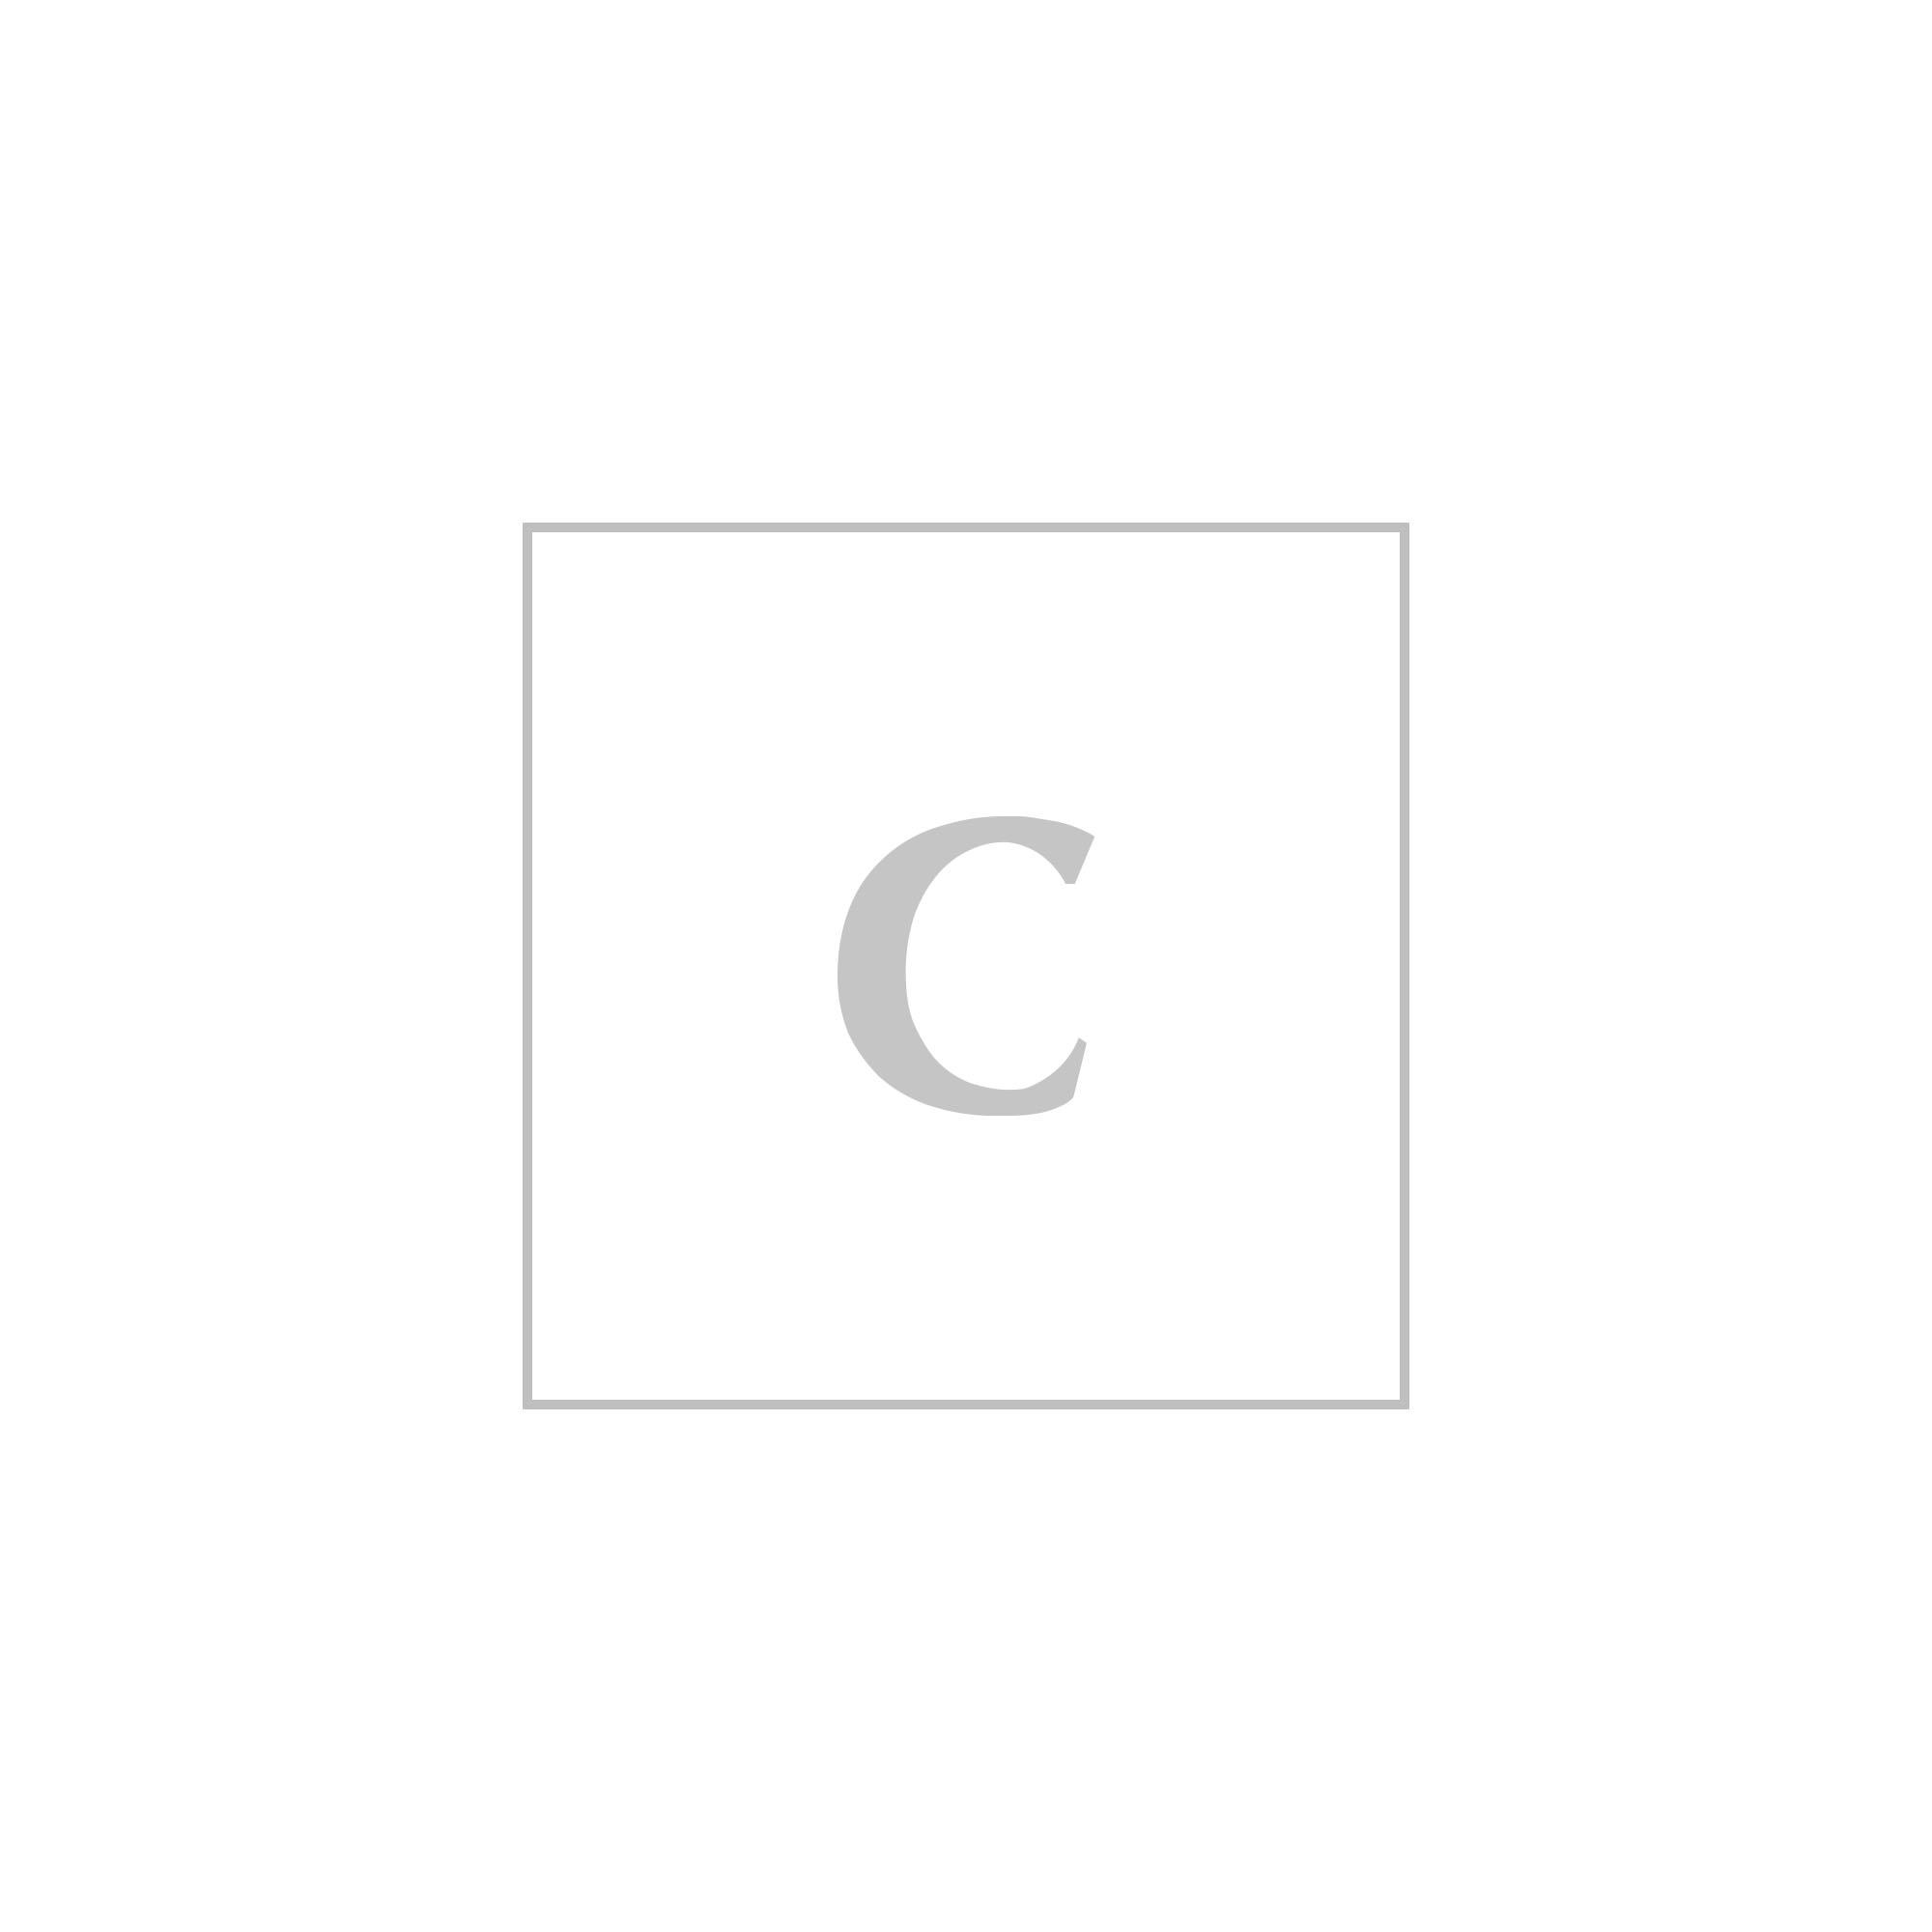 Saint laurent ysl porta carte credito monogram